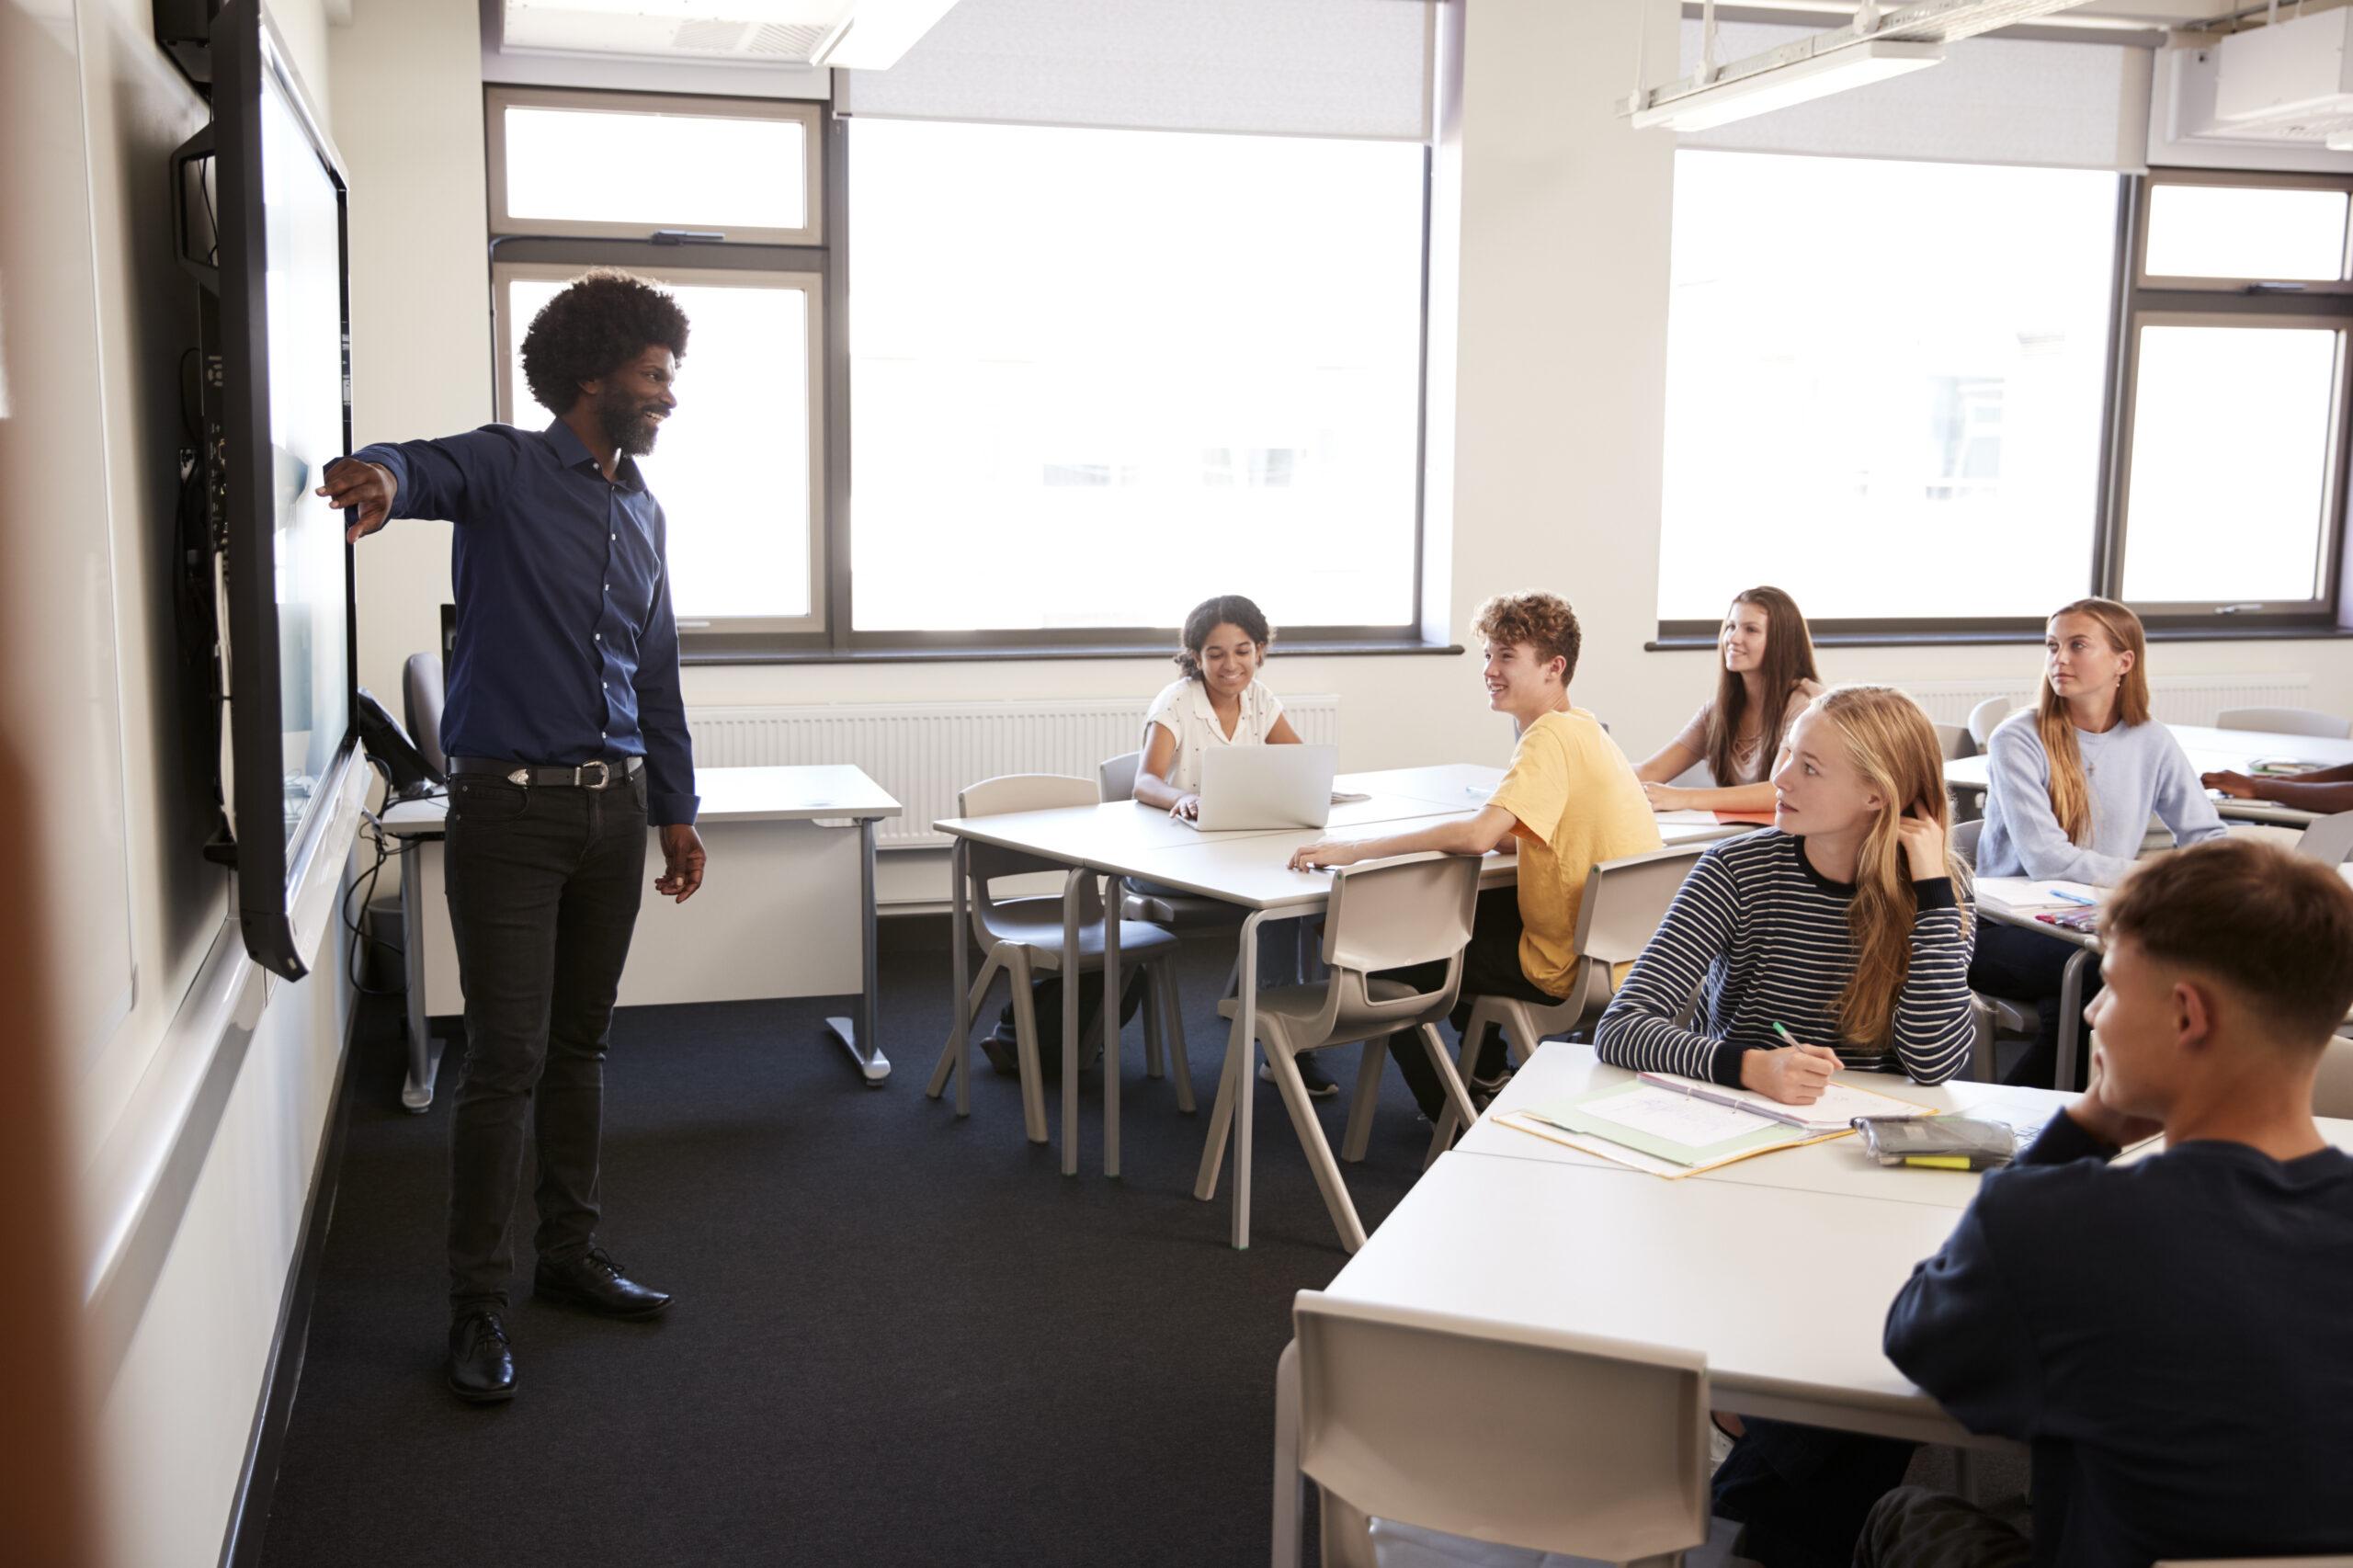 Smart Interactive Classroom